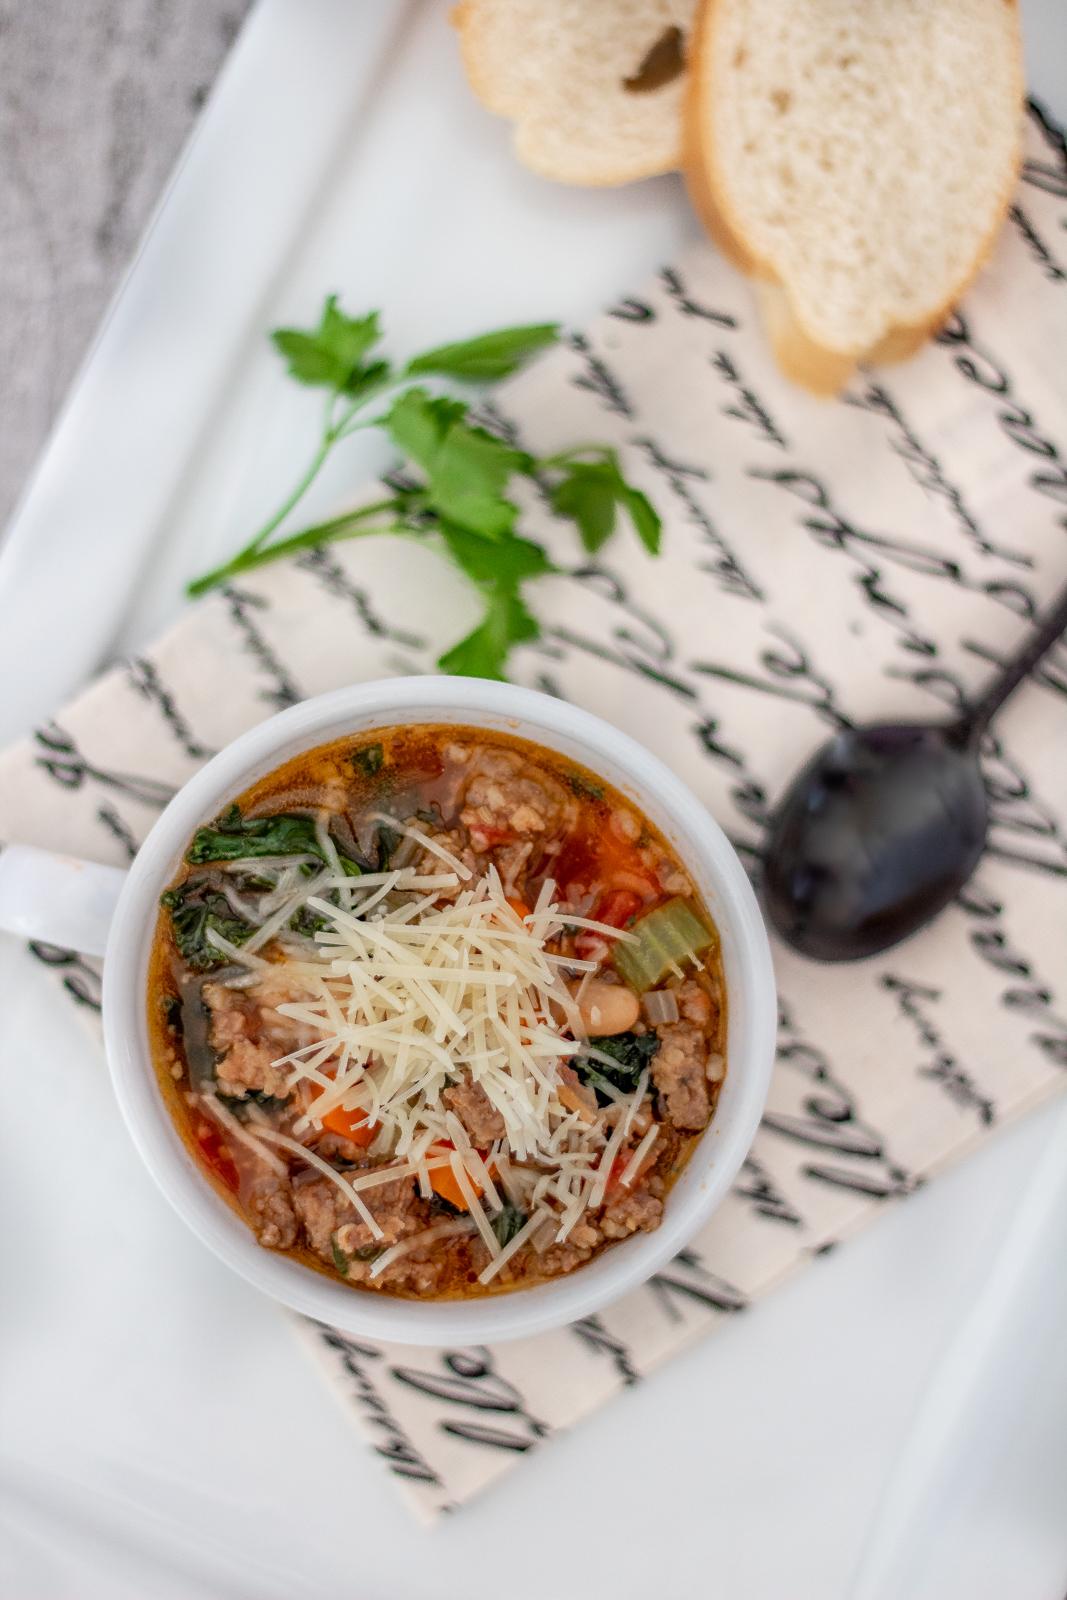 Kale Sausage and white bean soup recipe